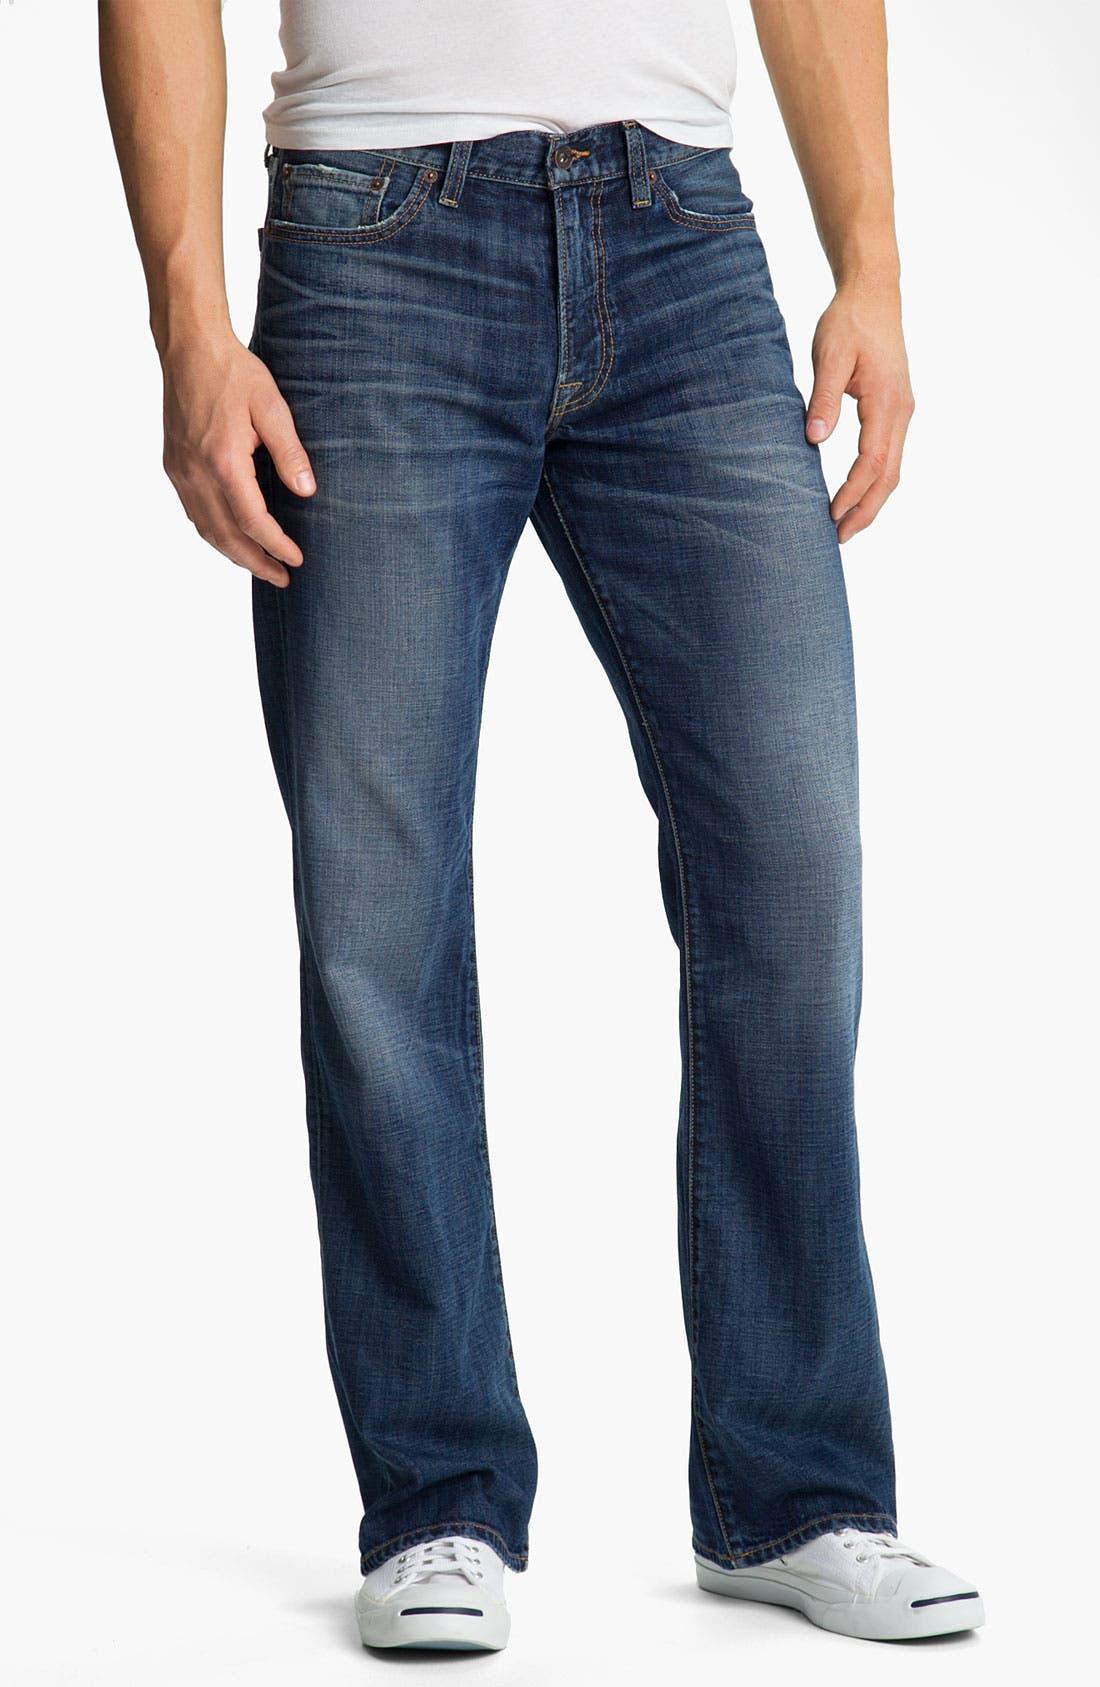 Main Image - Lucky Brand Bootcut Jeans (Medium Edwin Warner)